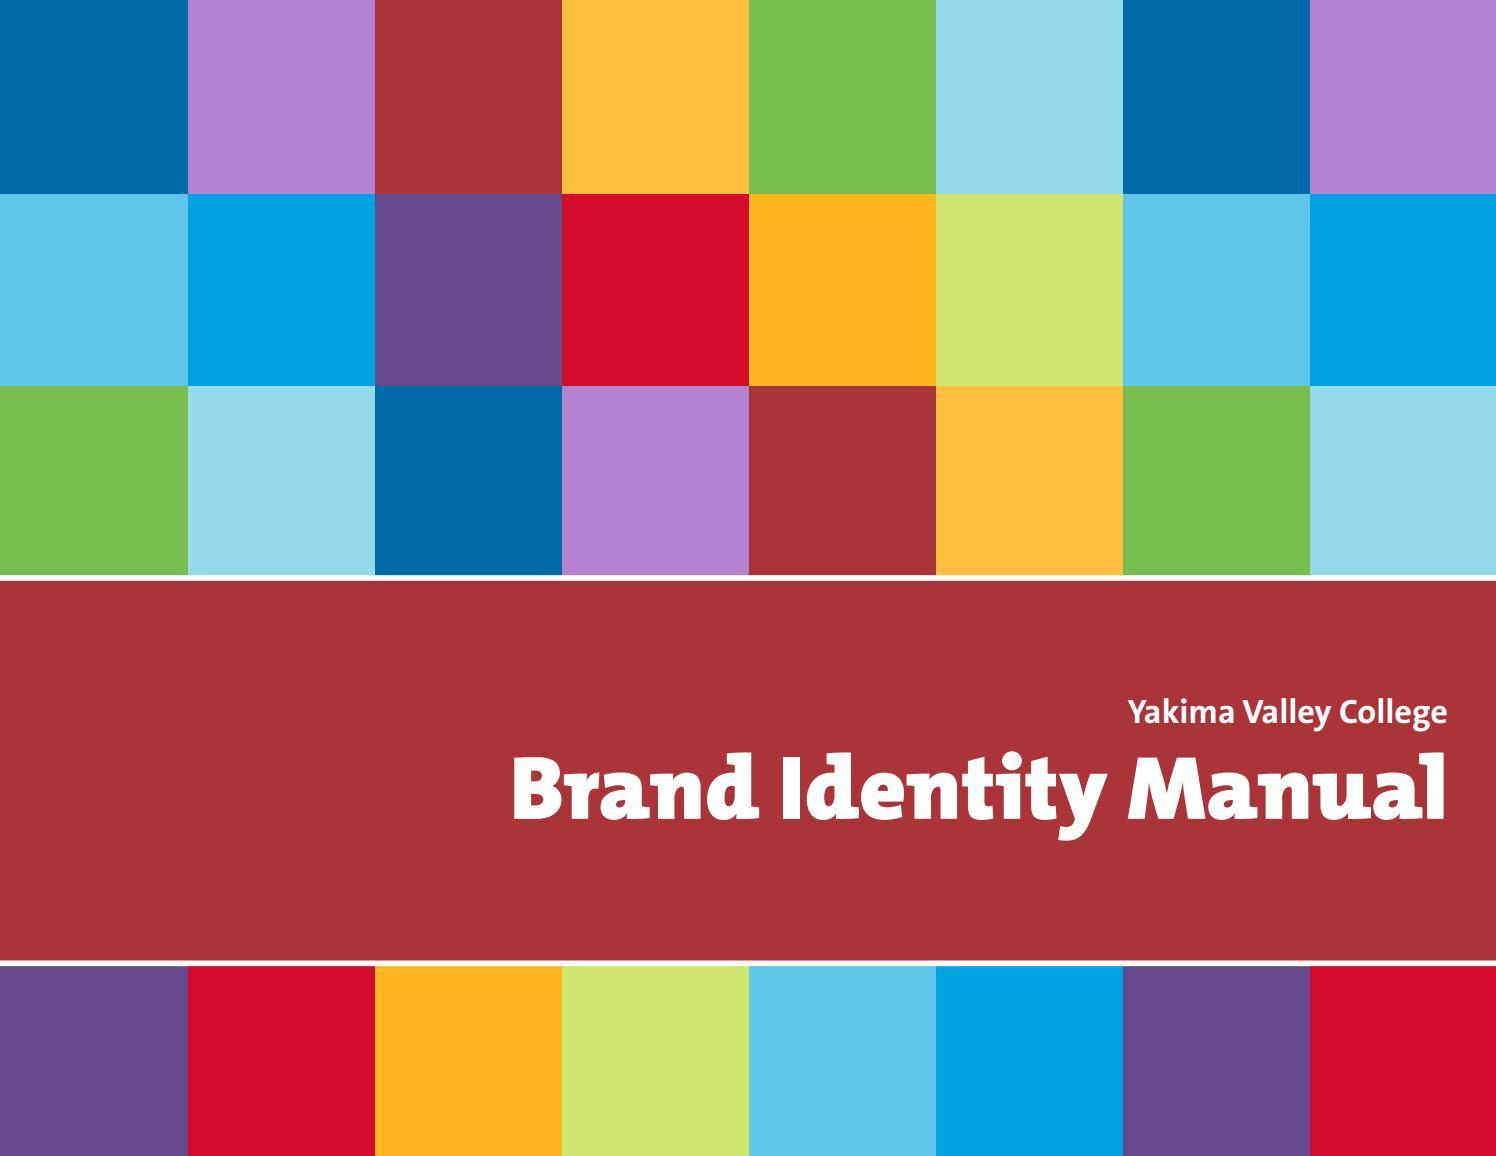 Brand Identity Manual 11 2016 By Yakima Valley Community College Issuu